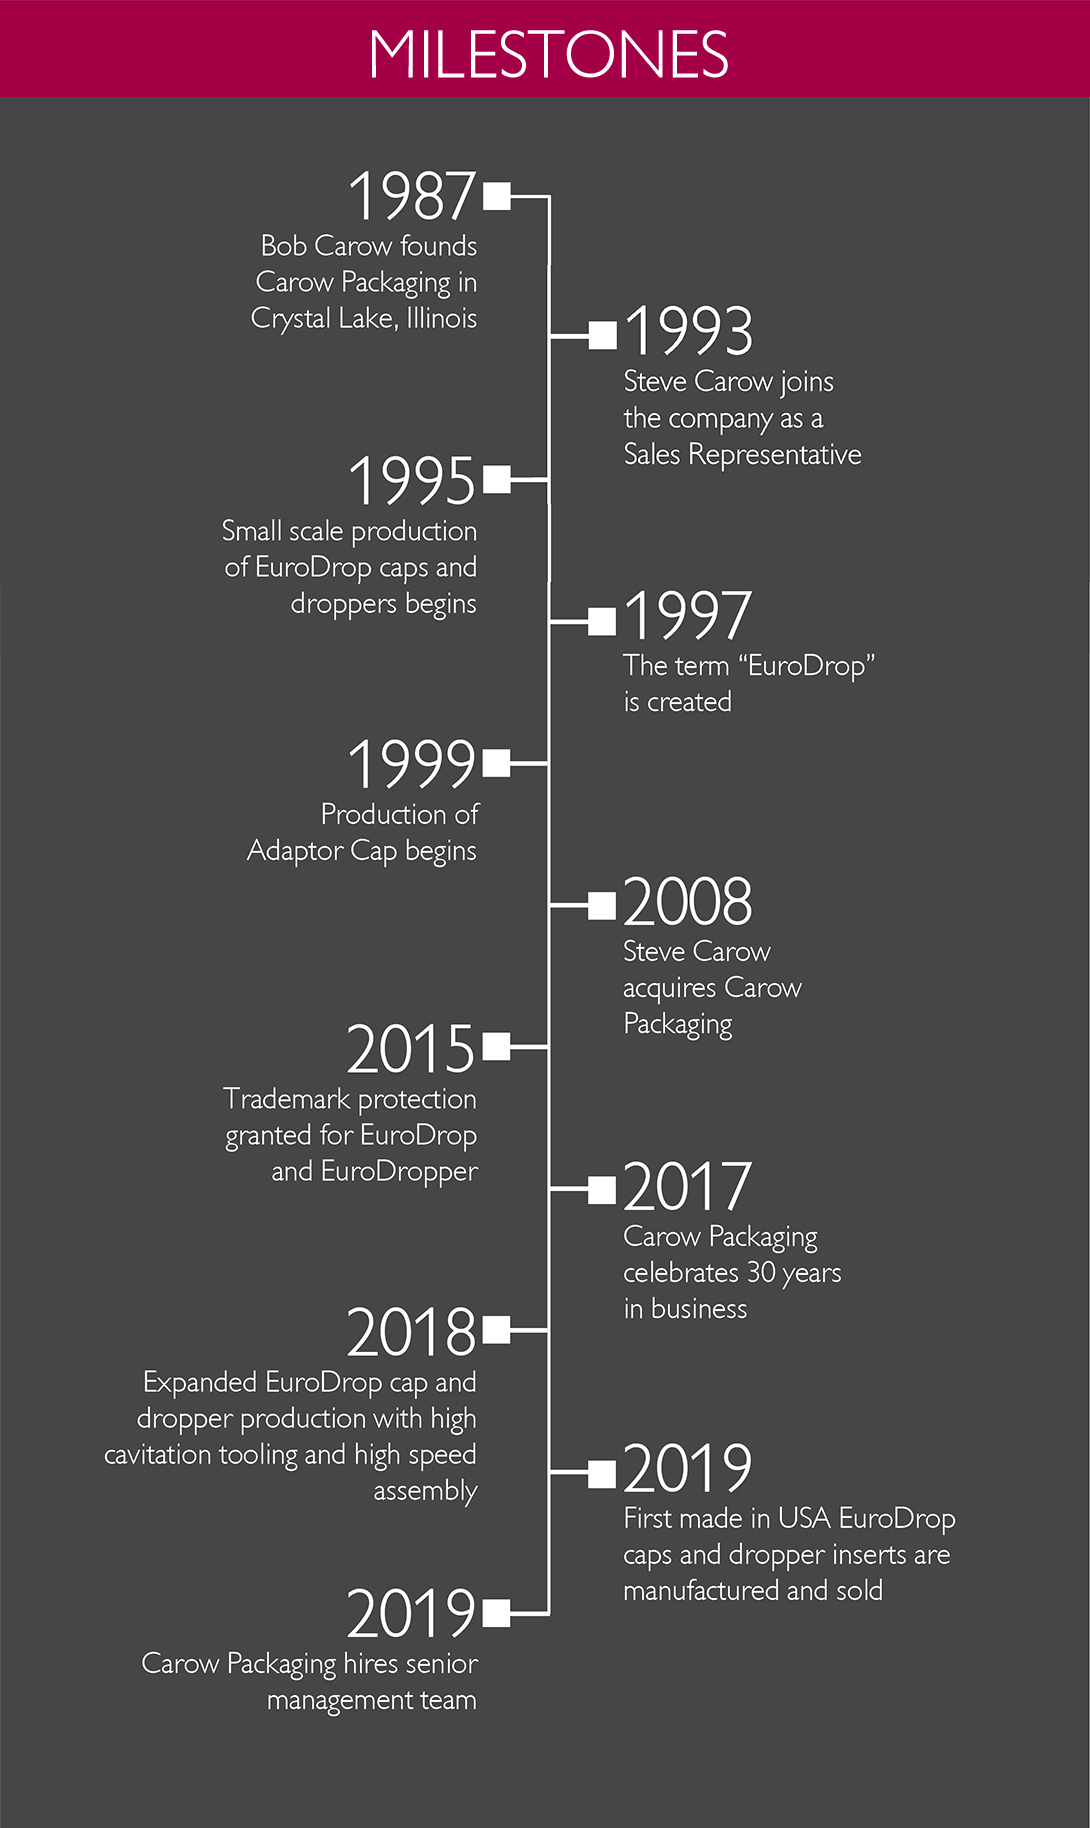 carow-milestones